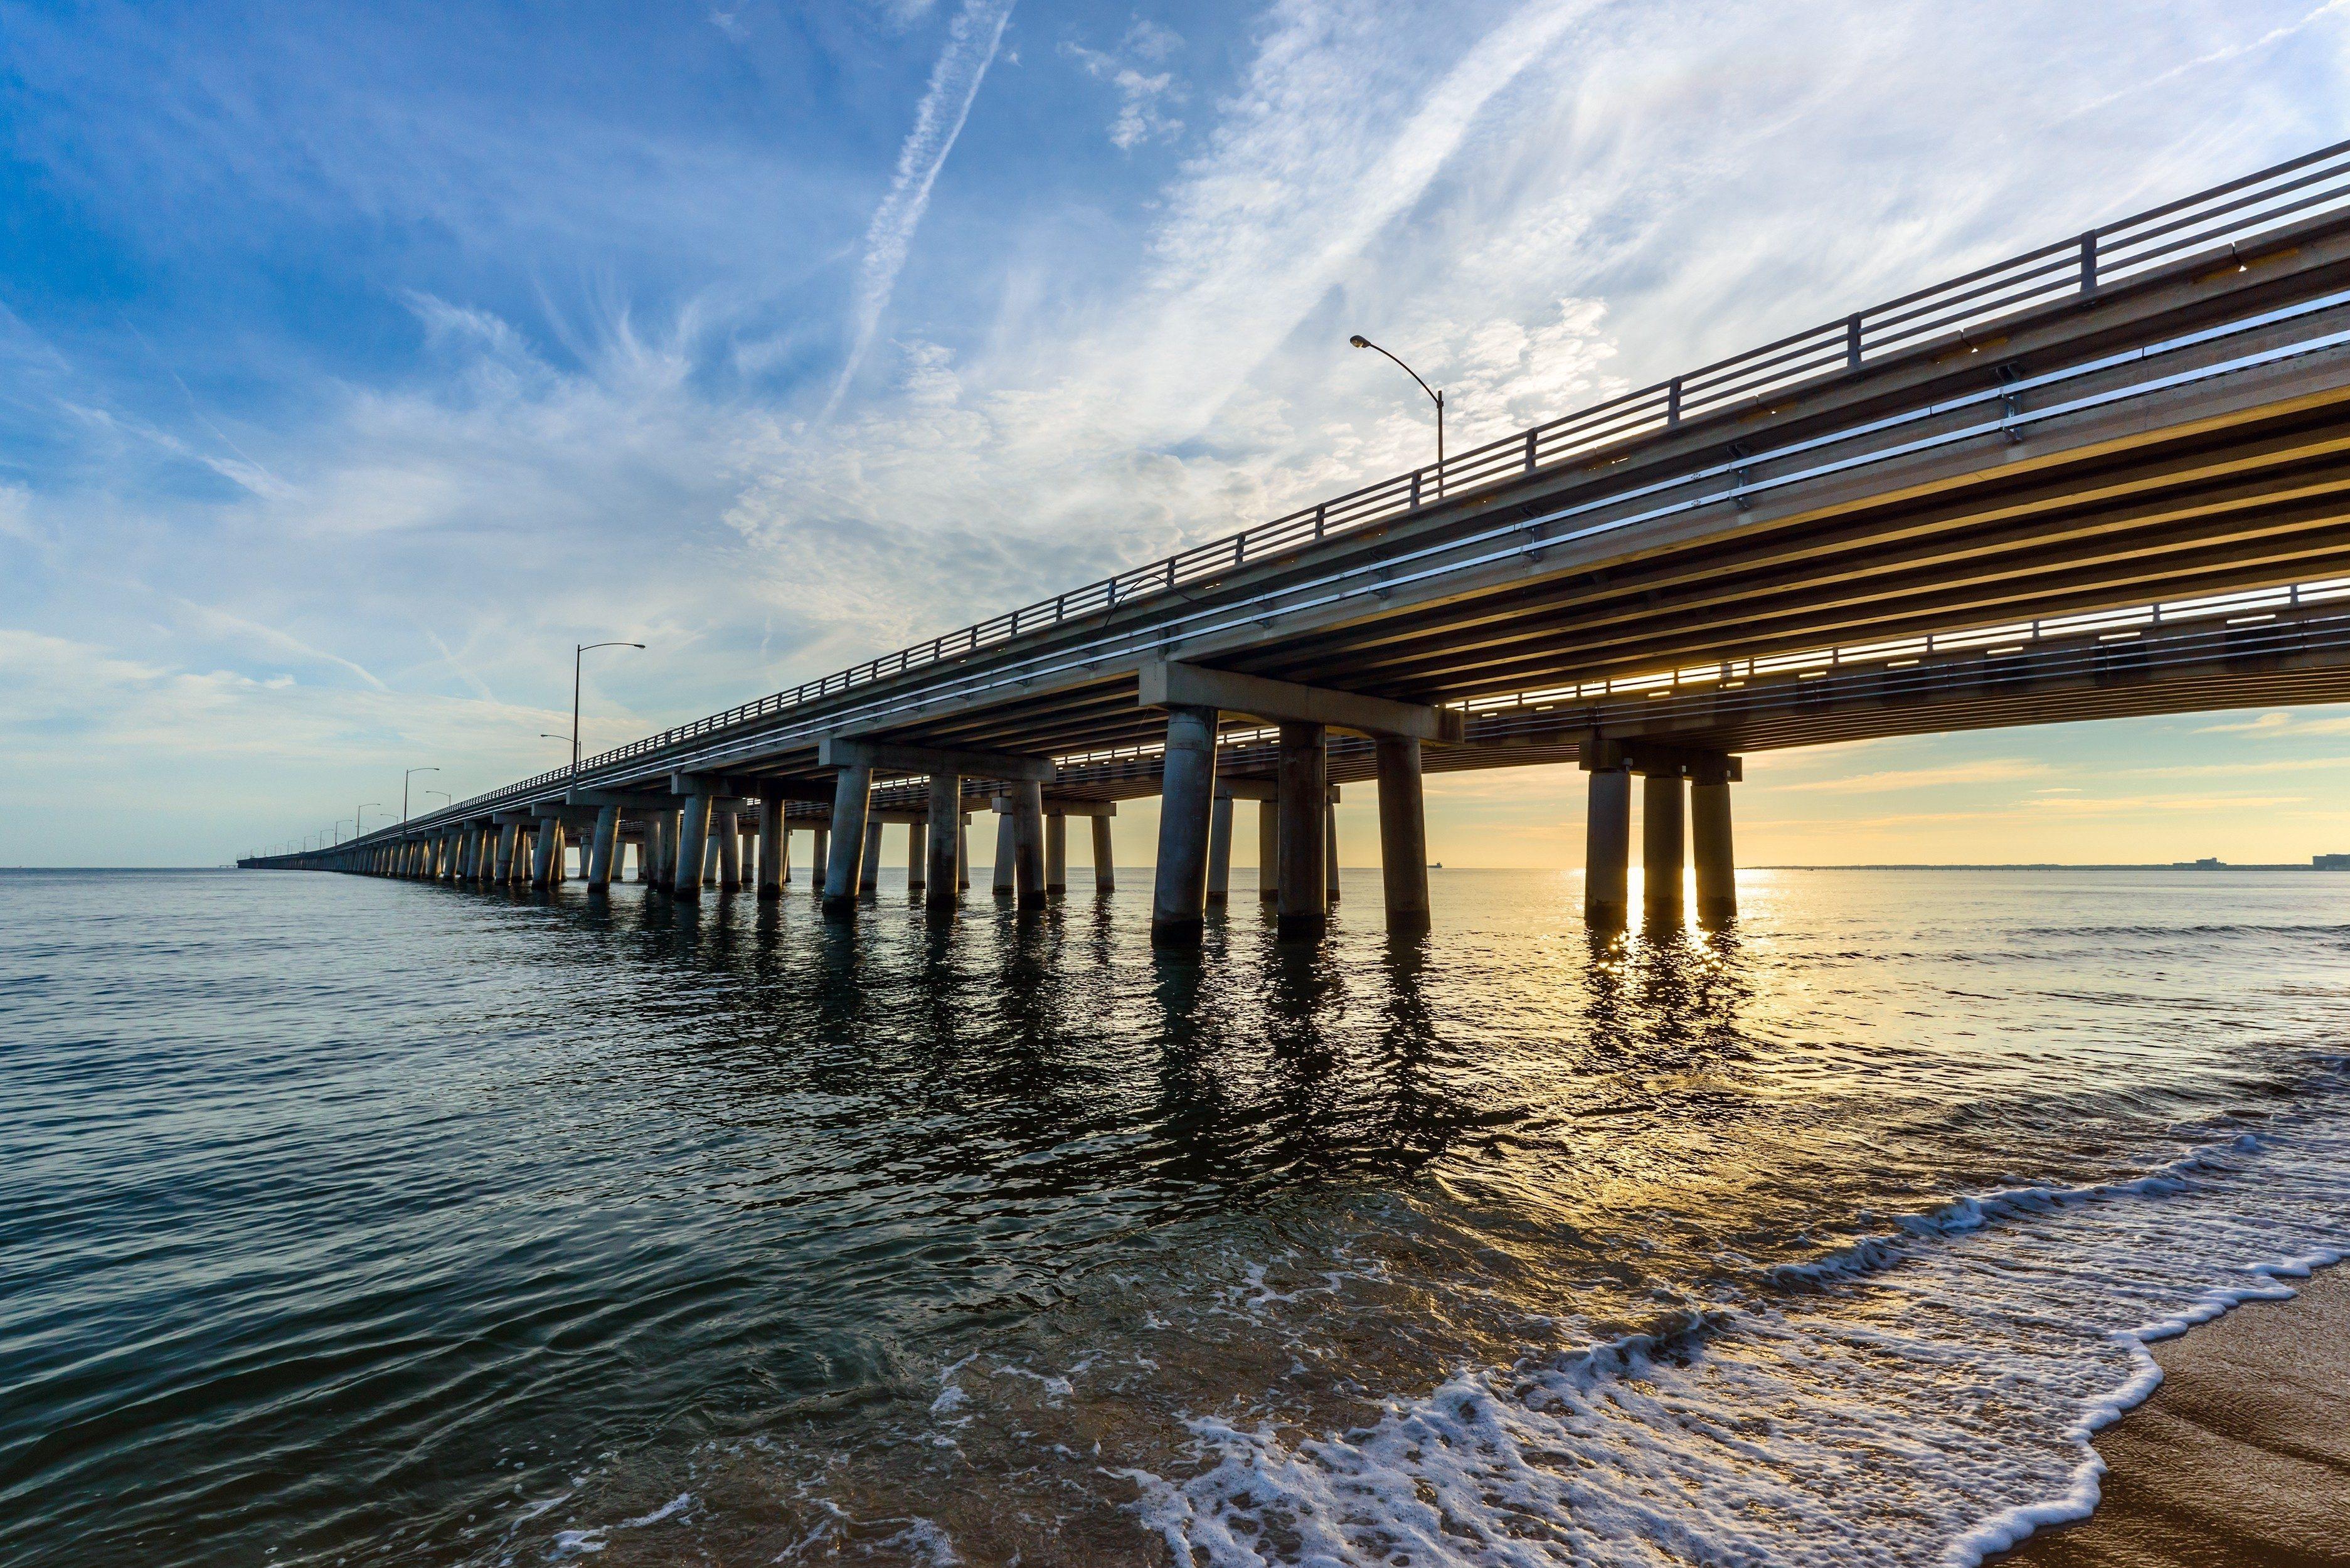 Chesapeake Bay Bridge - Virginia Beach side